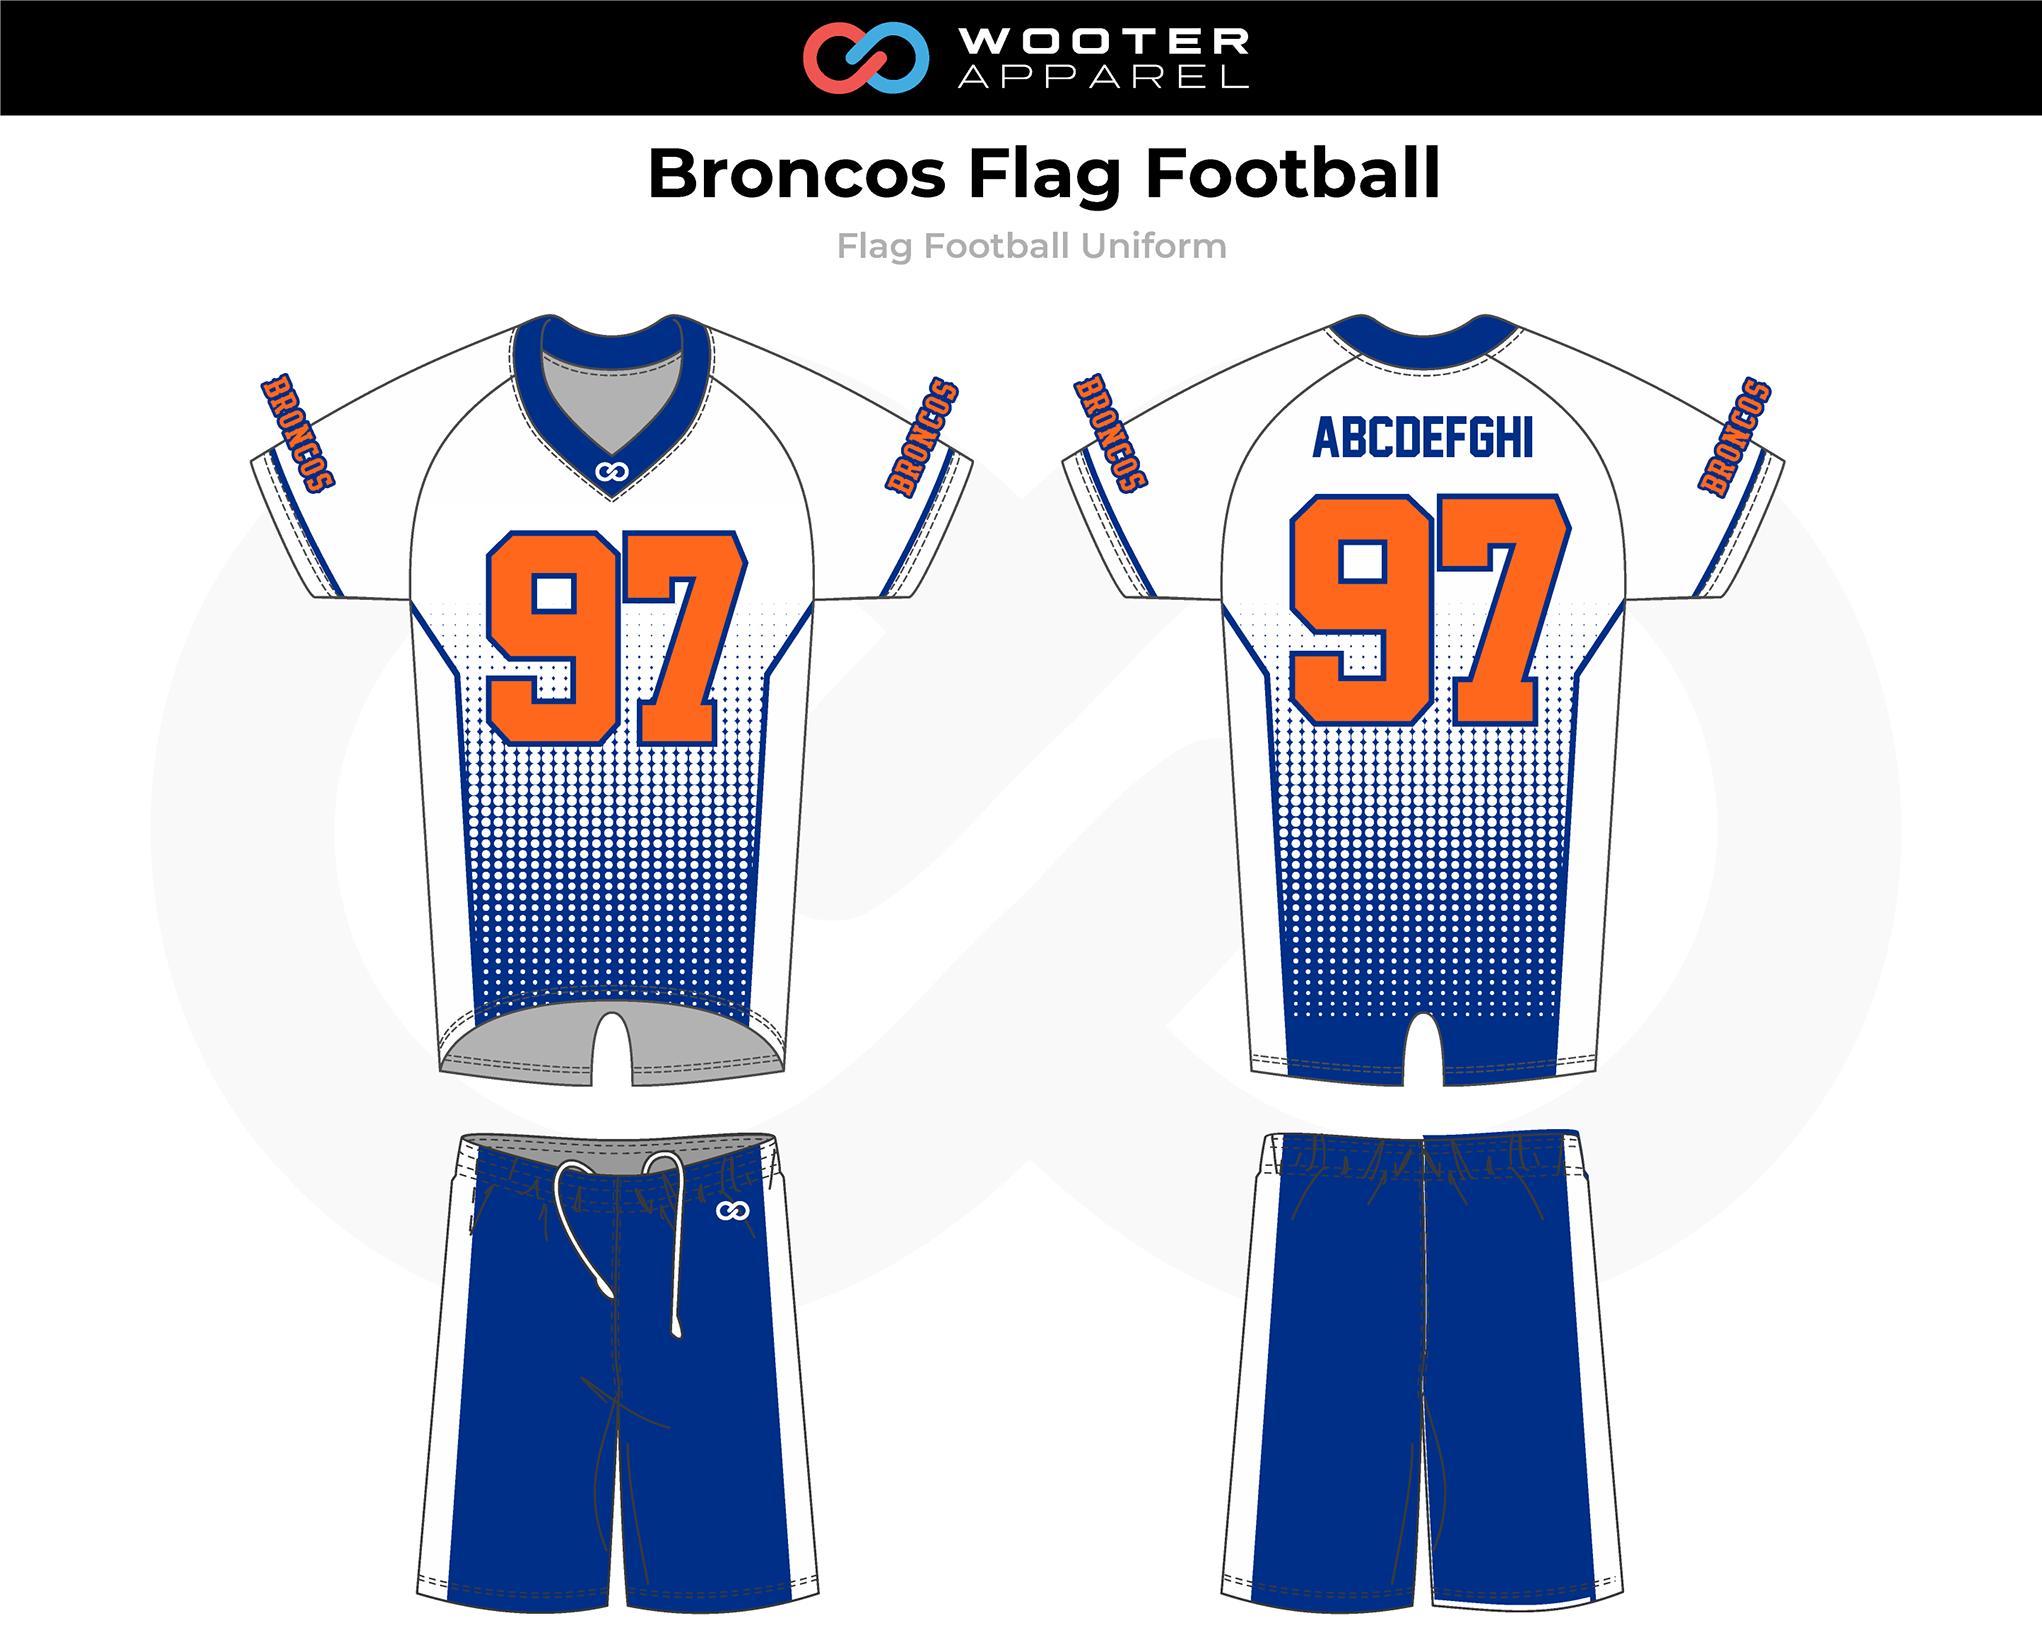 2019-02-04 Broncos Flag Football Uniform (Dots) (Away).png